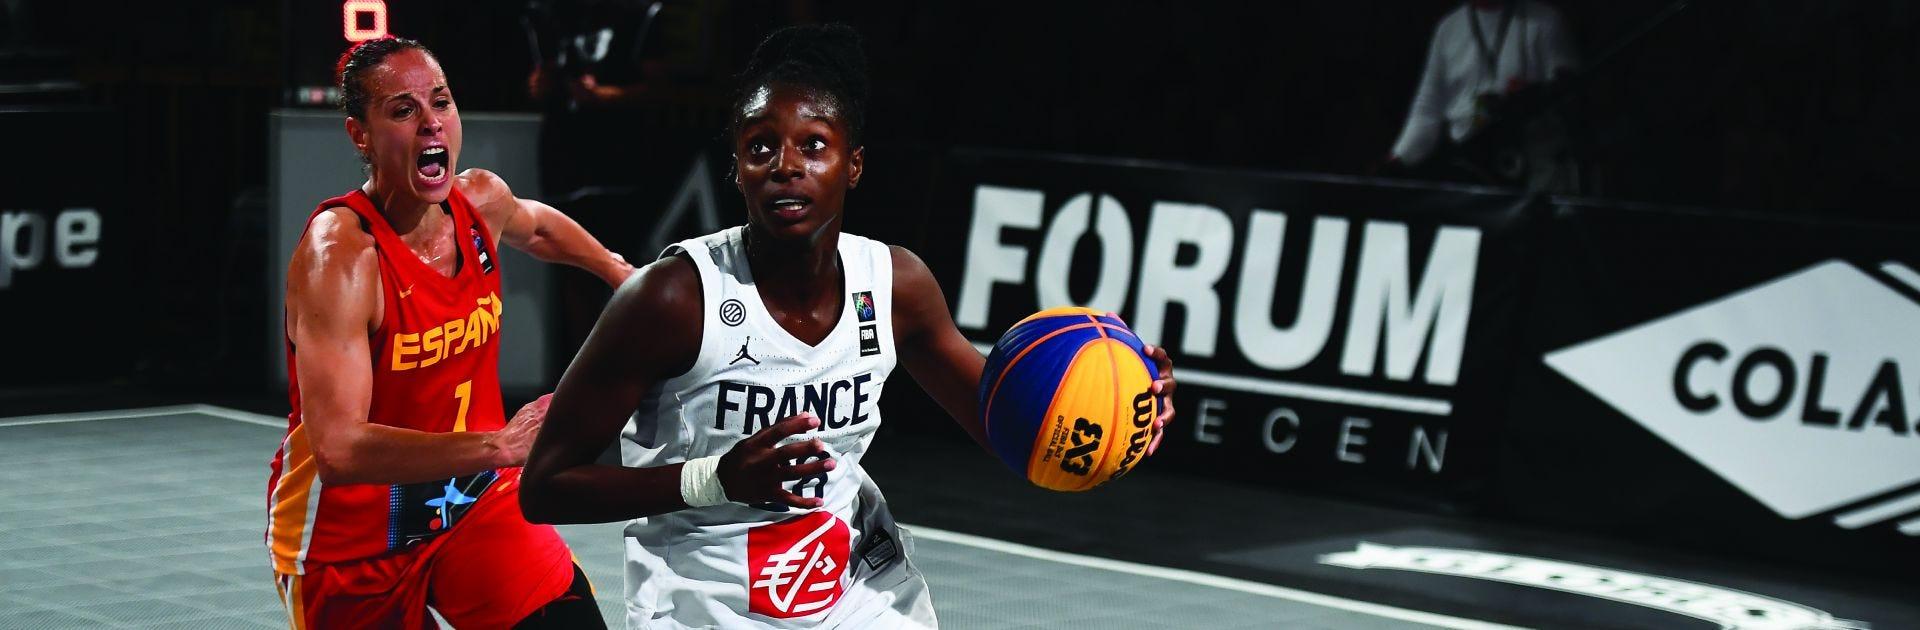 migna toures on the court